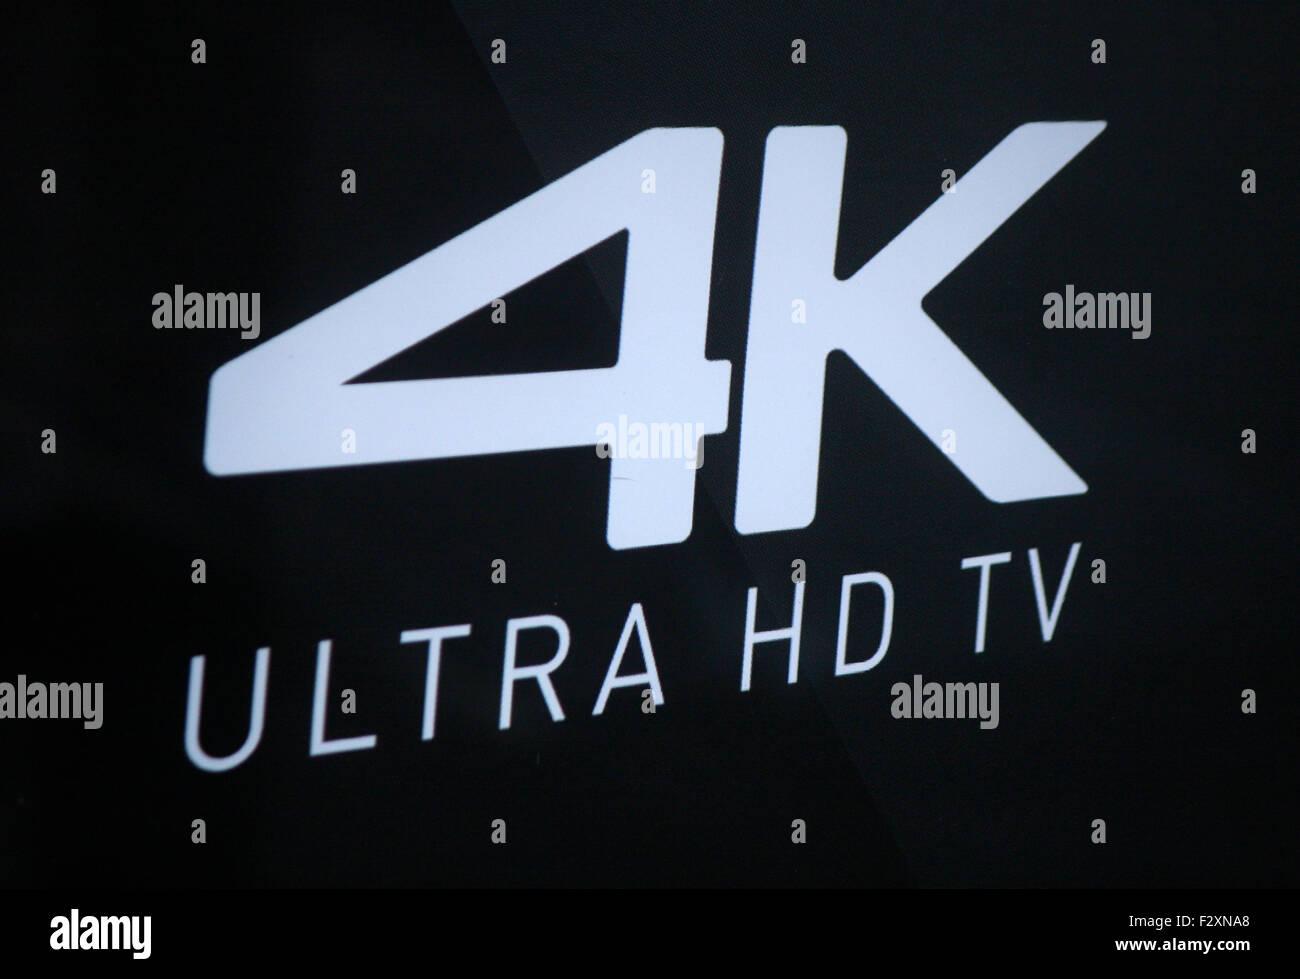 Markenname: '4k Ultra HD TV', Berlino. Immagini Stock